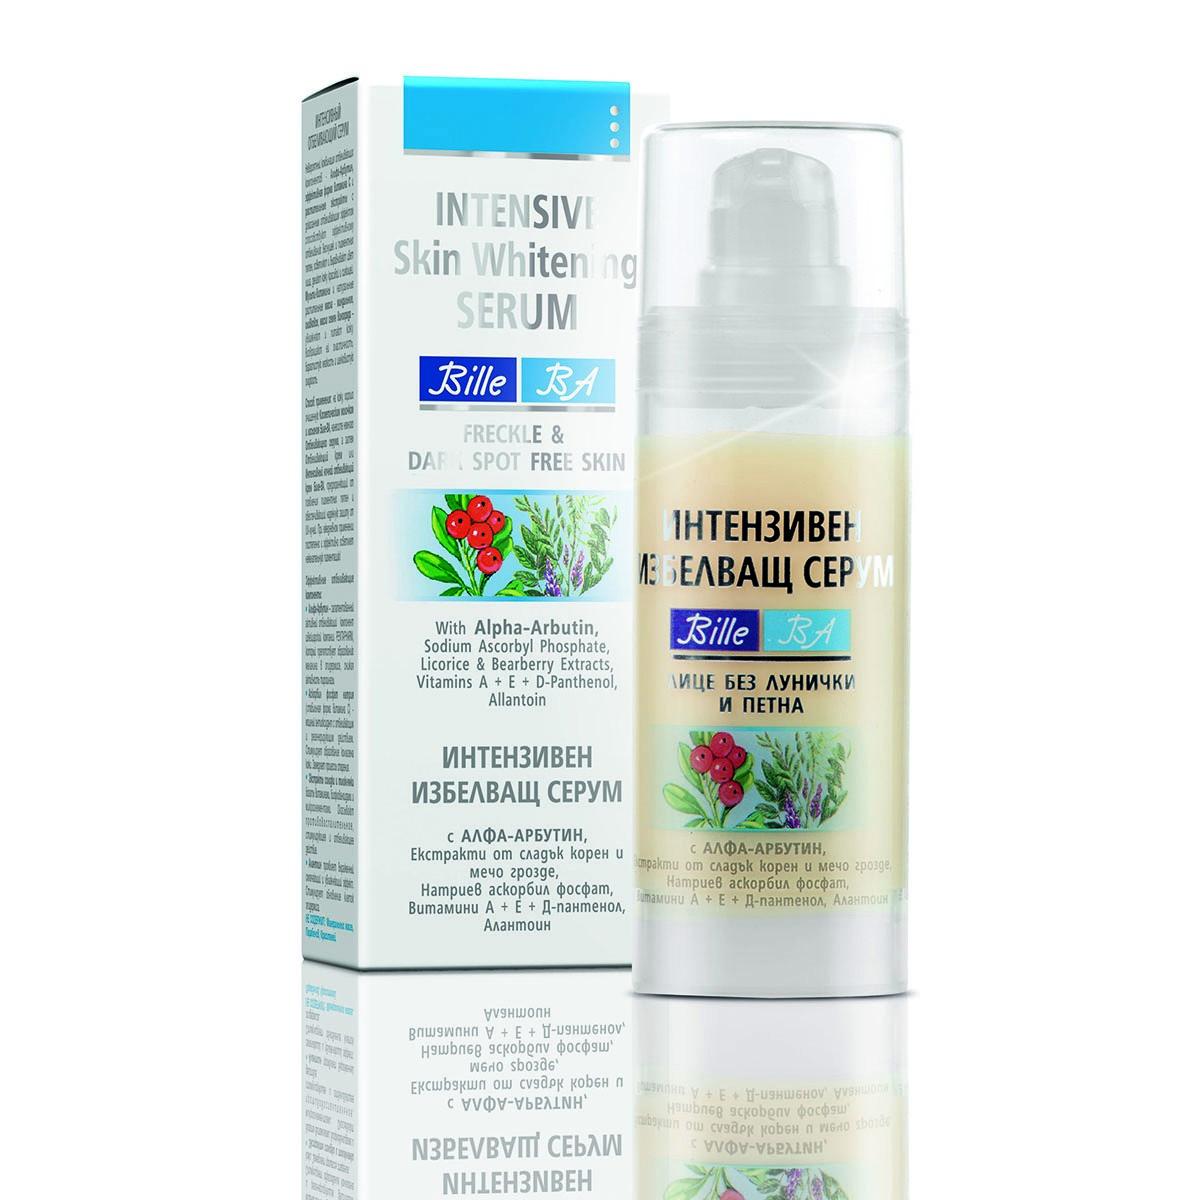 Intensive skin whitening face serum Bodi Beauty